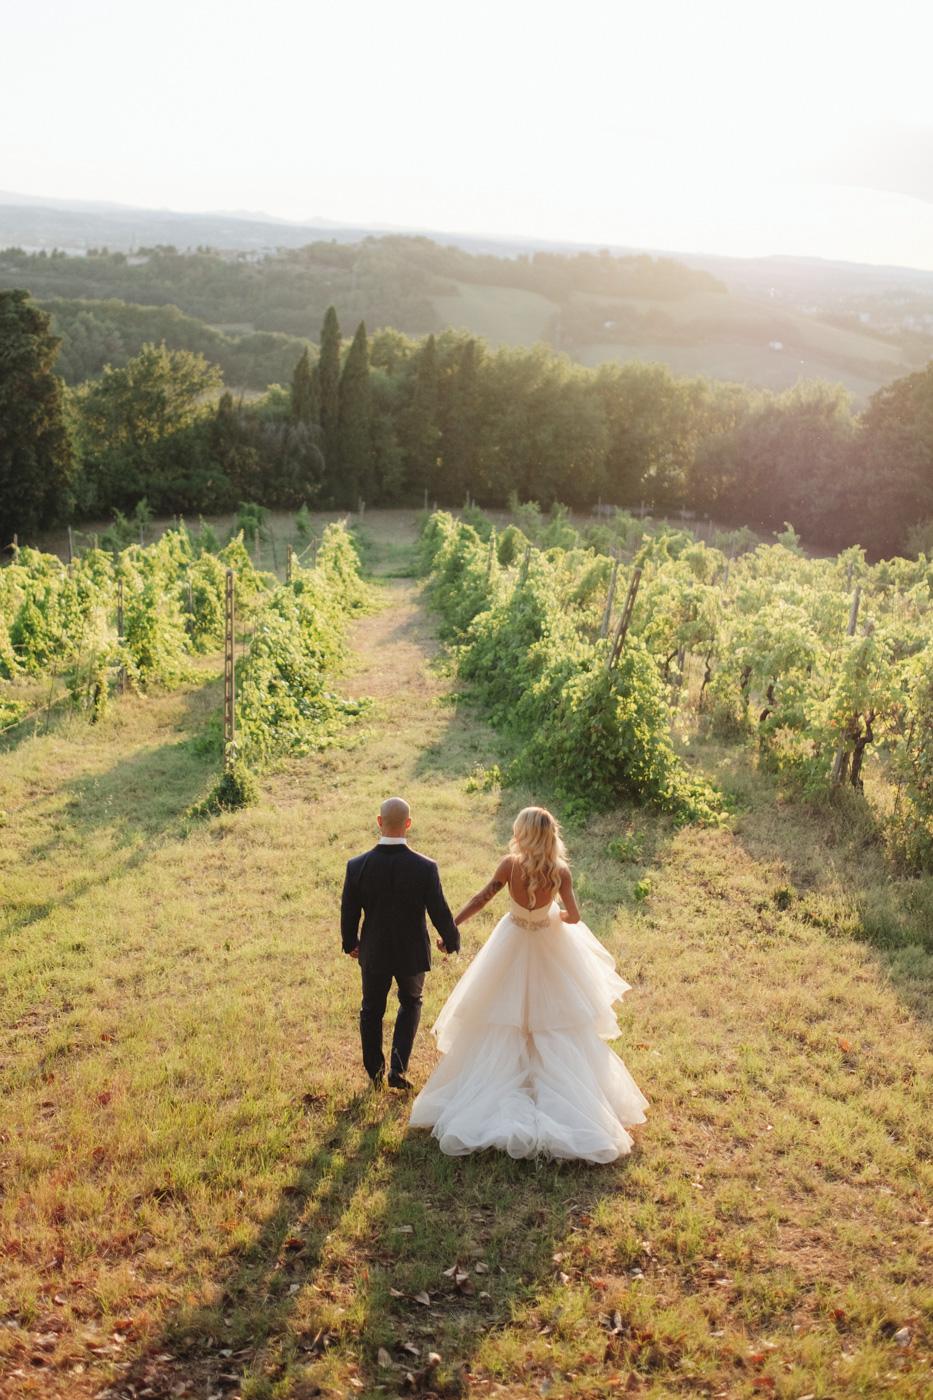 Matrimoni all'italiana wedding photographer italy-121.jpg